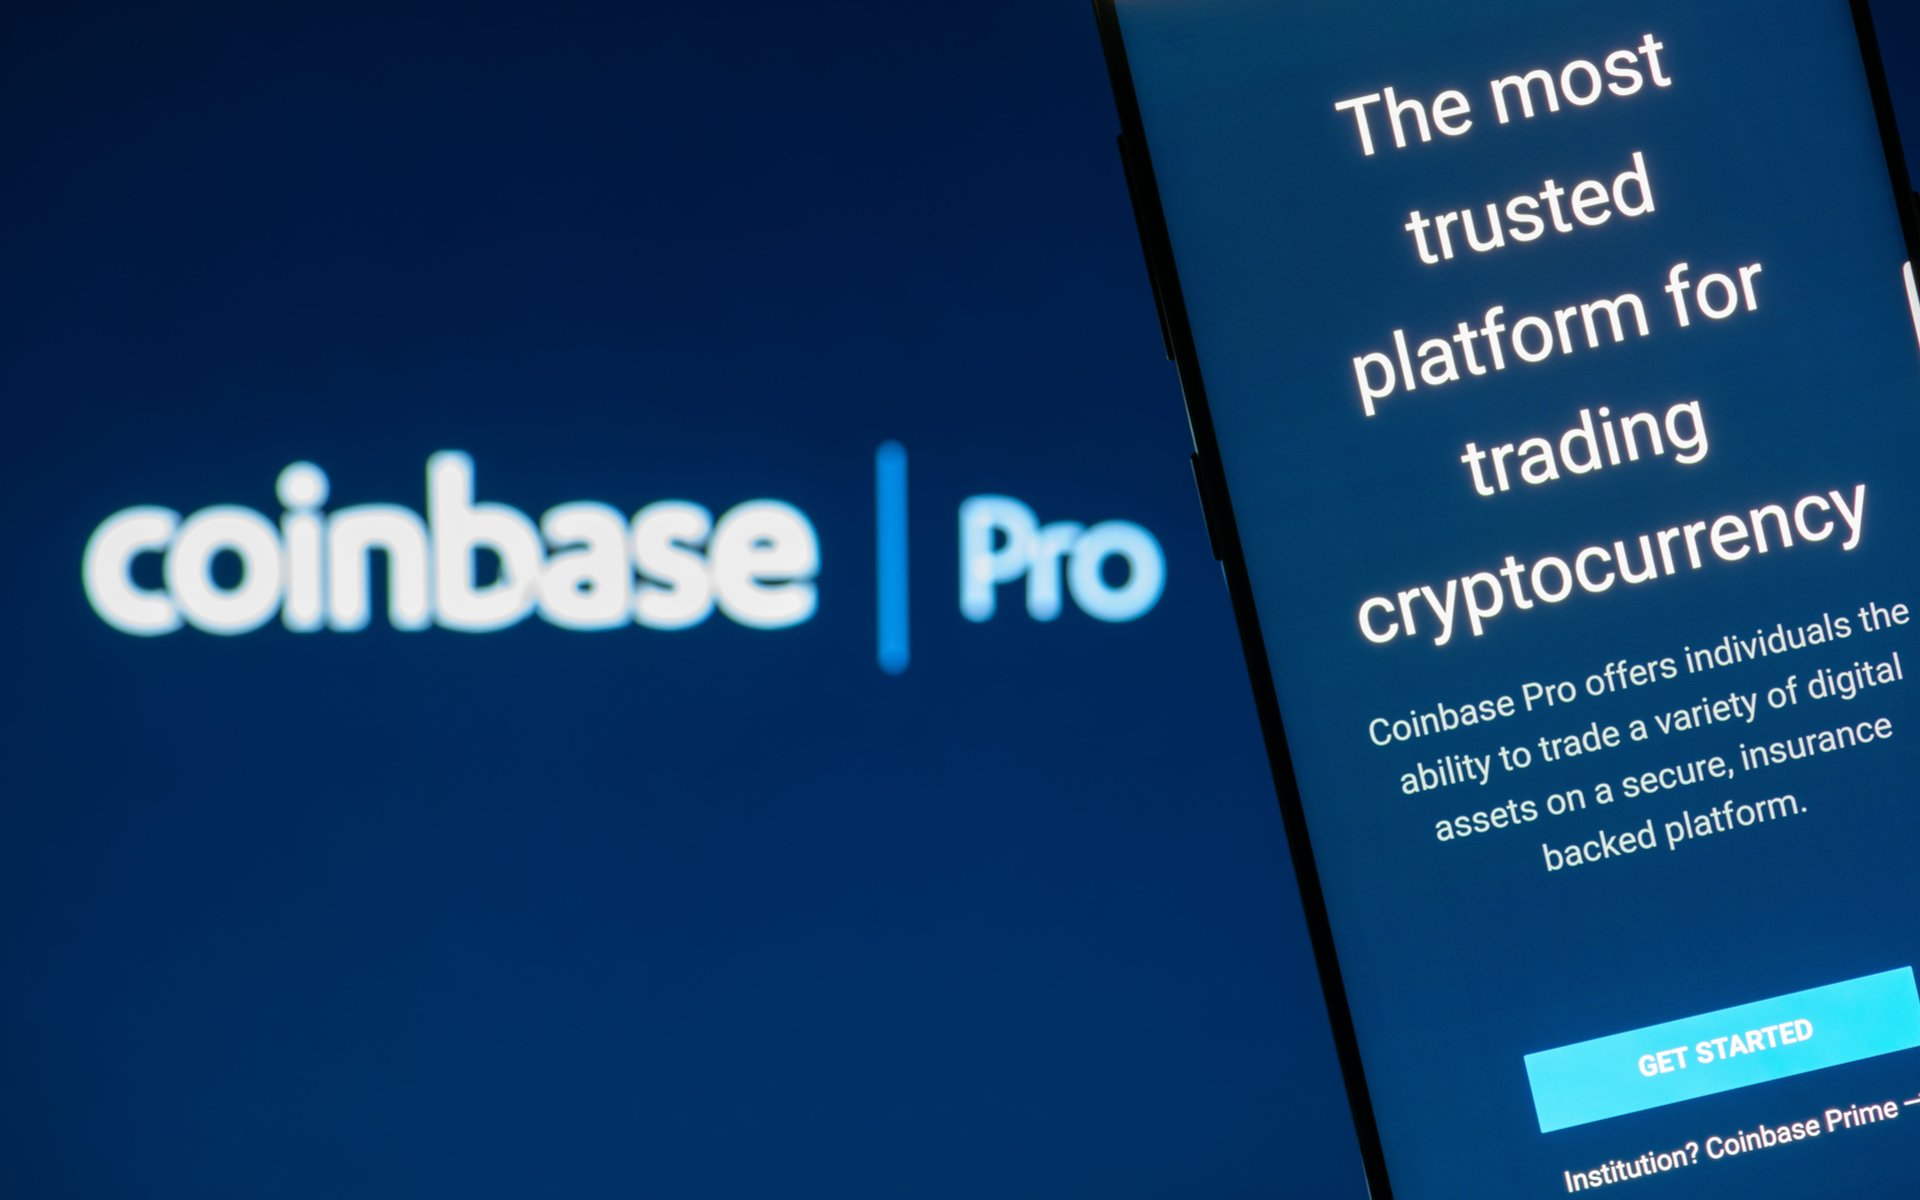 Coinbase agregará soporte para trading de DASH en su plataforma profesional